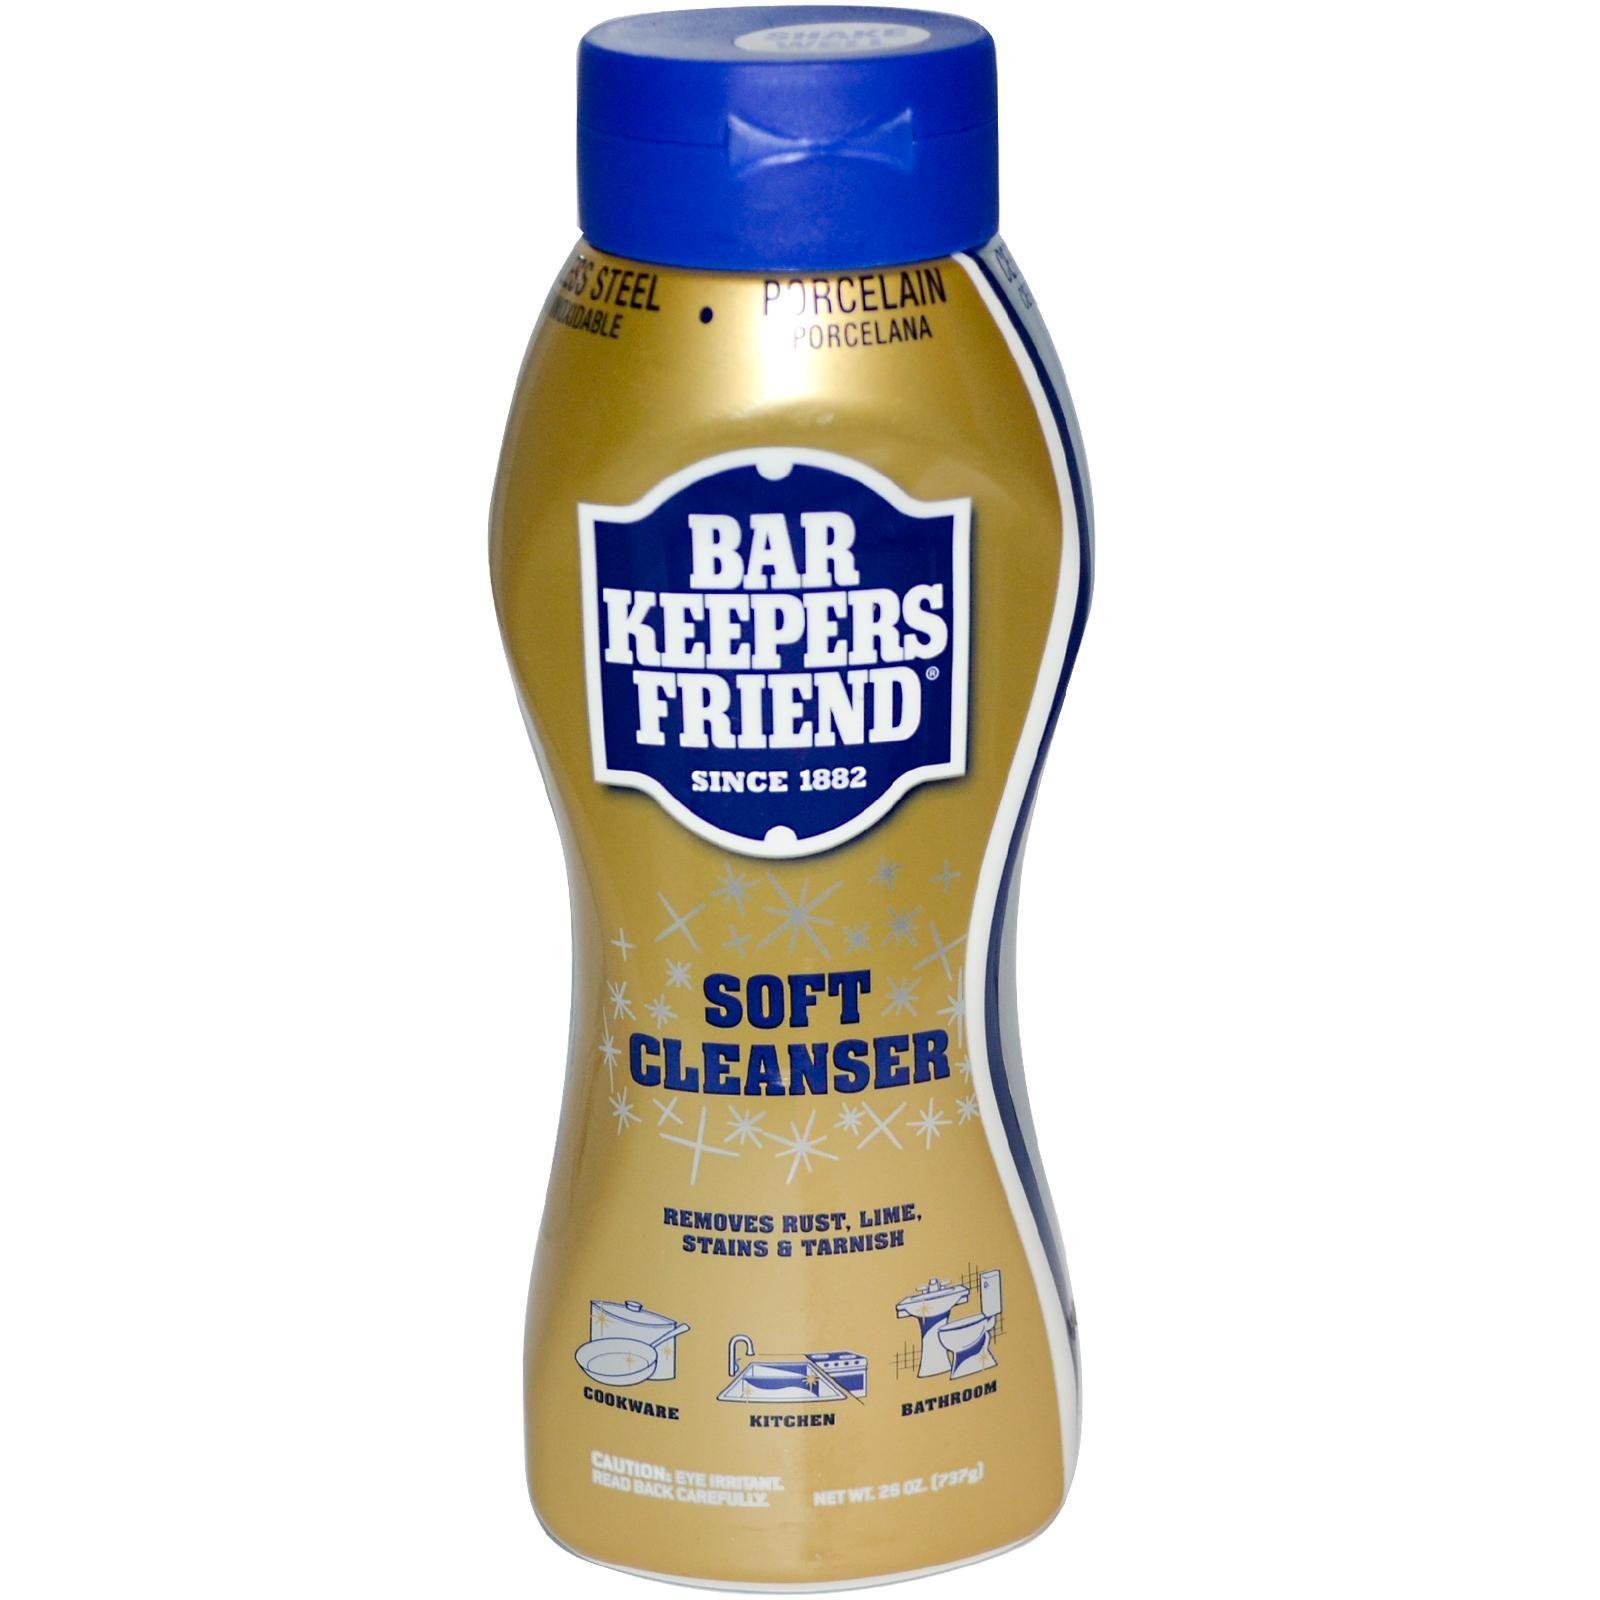 Bar keepers friend soft cleanser 26 oz 737 g